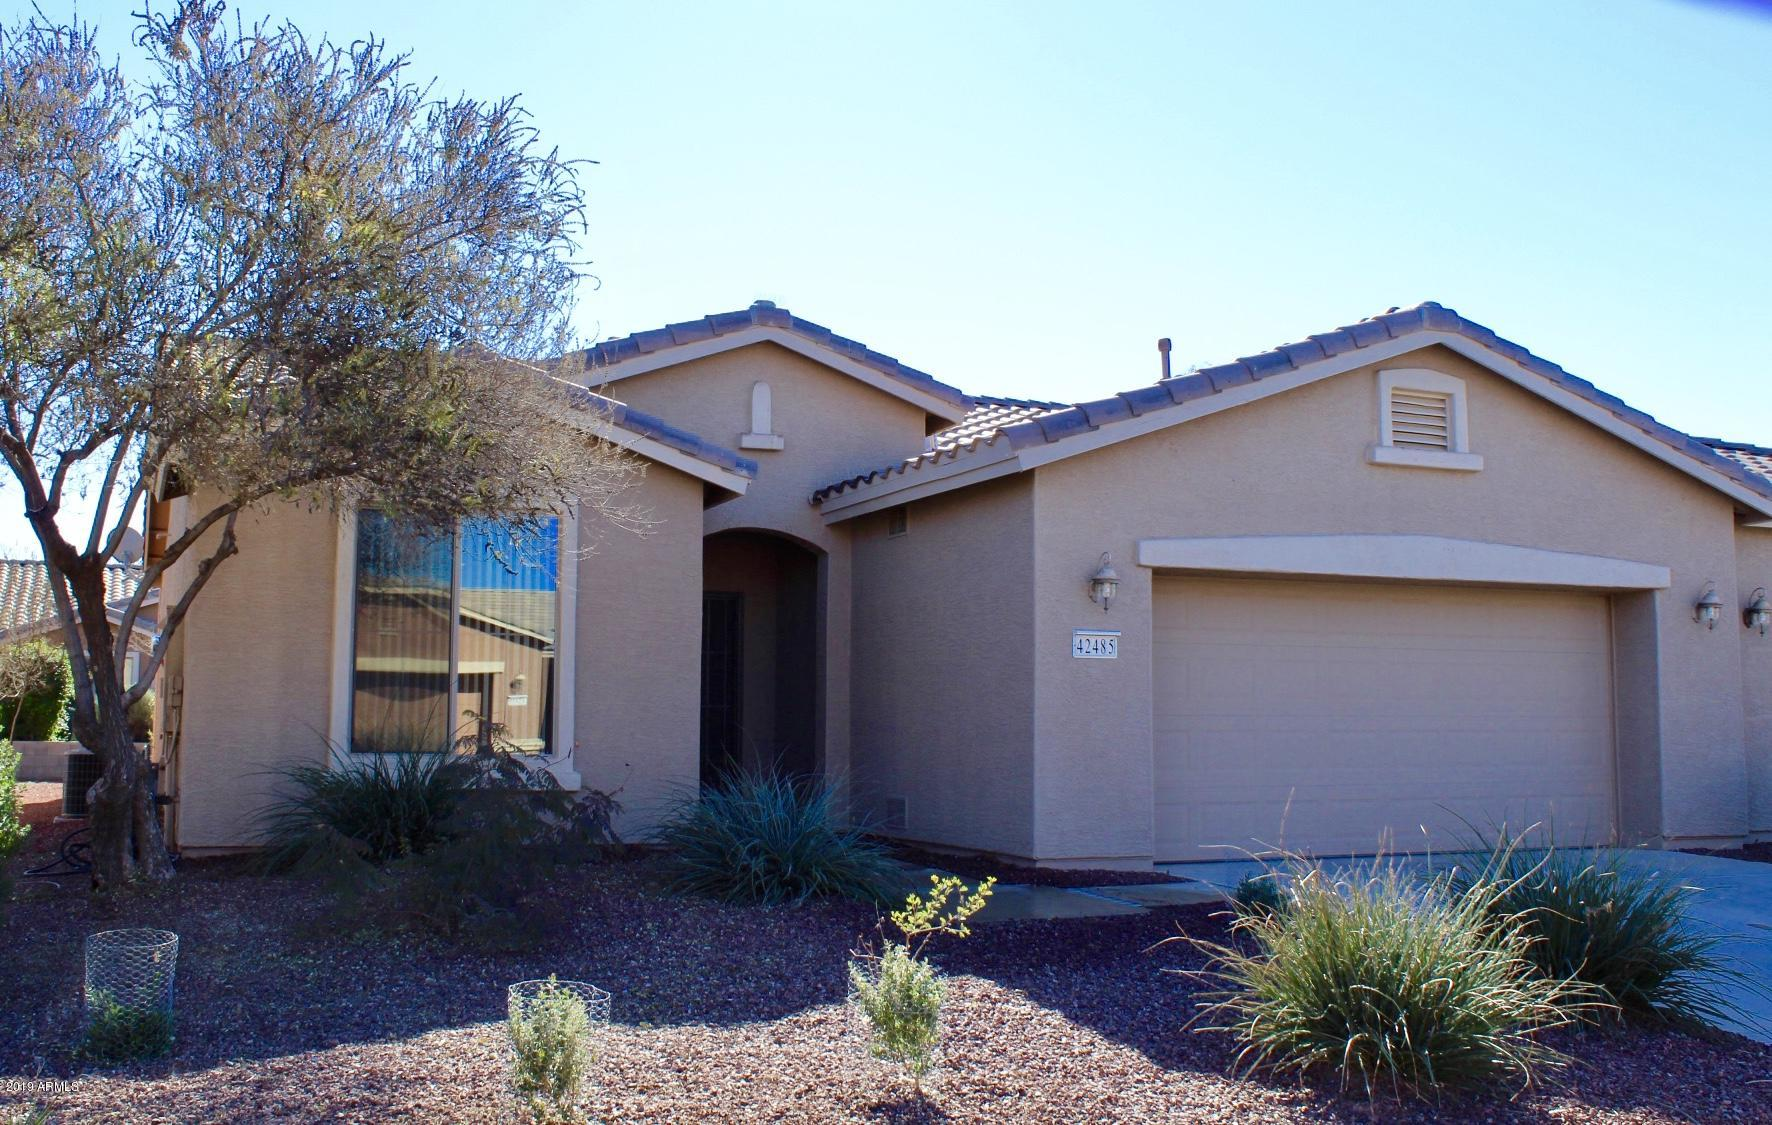 Photo of 42485 W JAWBREAKER Drive, Maricopa, AZ 85138